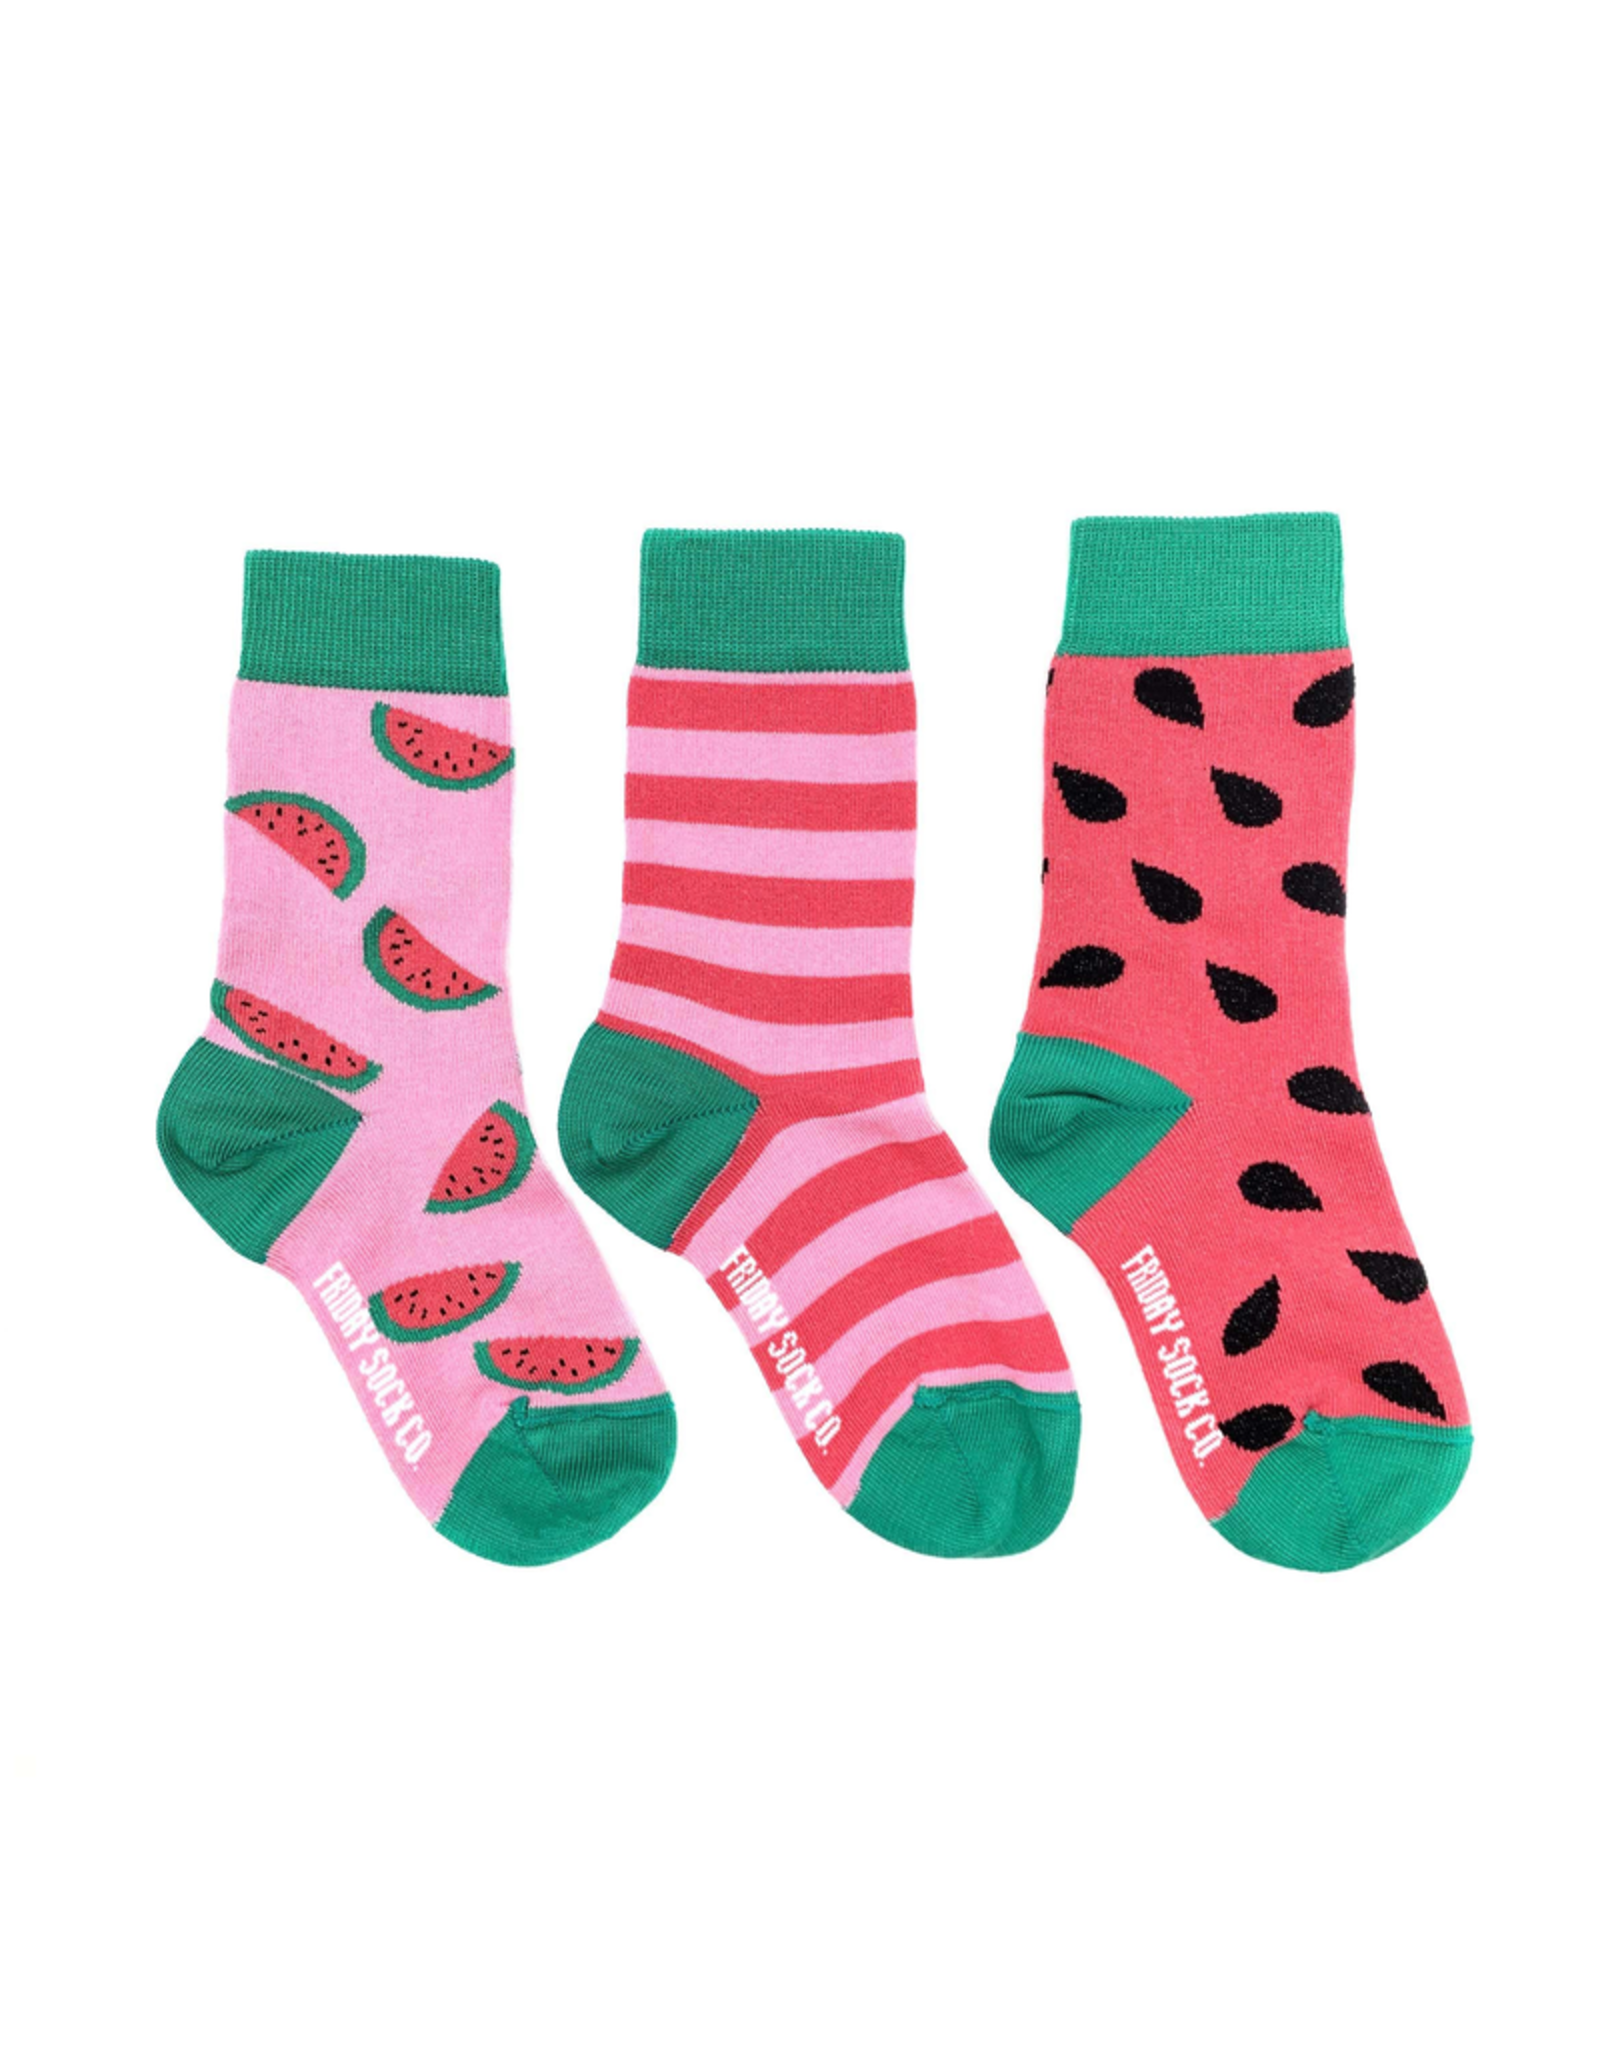 Friday Sock Co Friday Sock Co Watermelon Kids Socks-Age 2-4